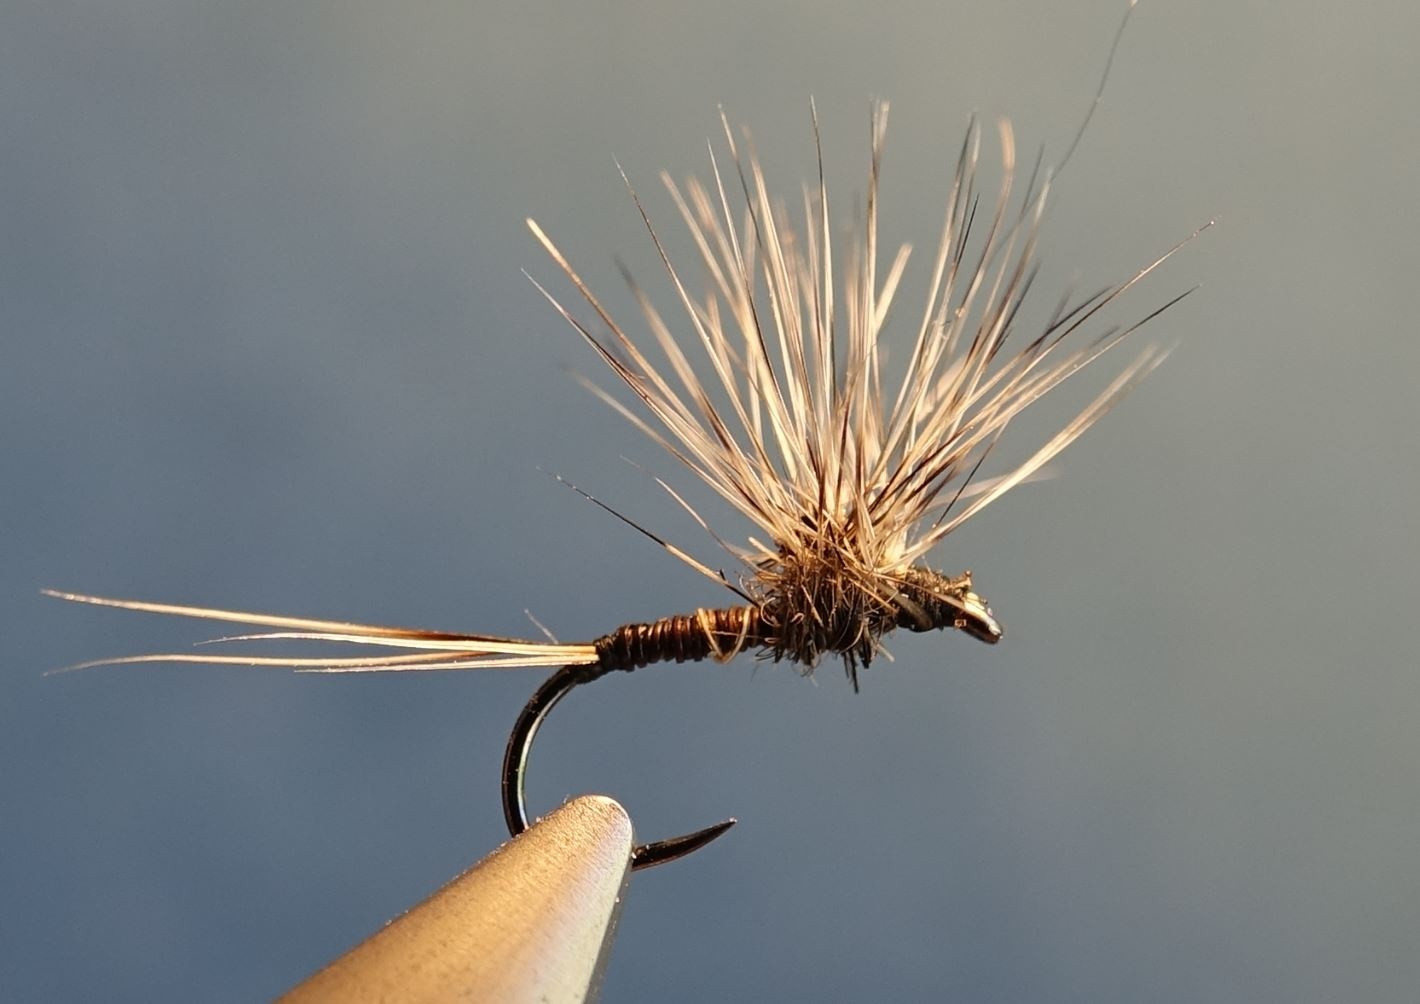 Ephemere parachutte blaireauu fly tying badger eclosion mouche